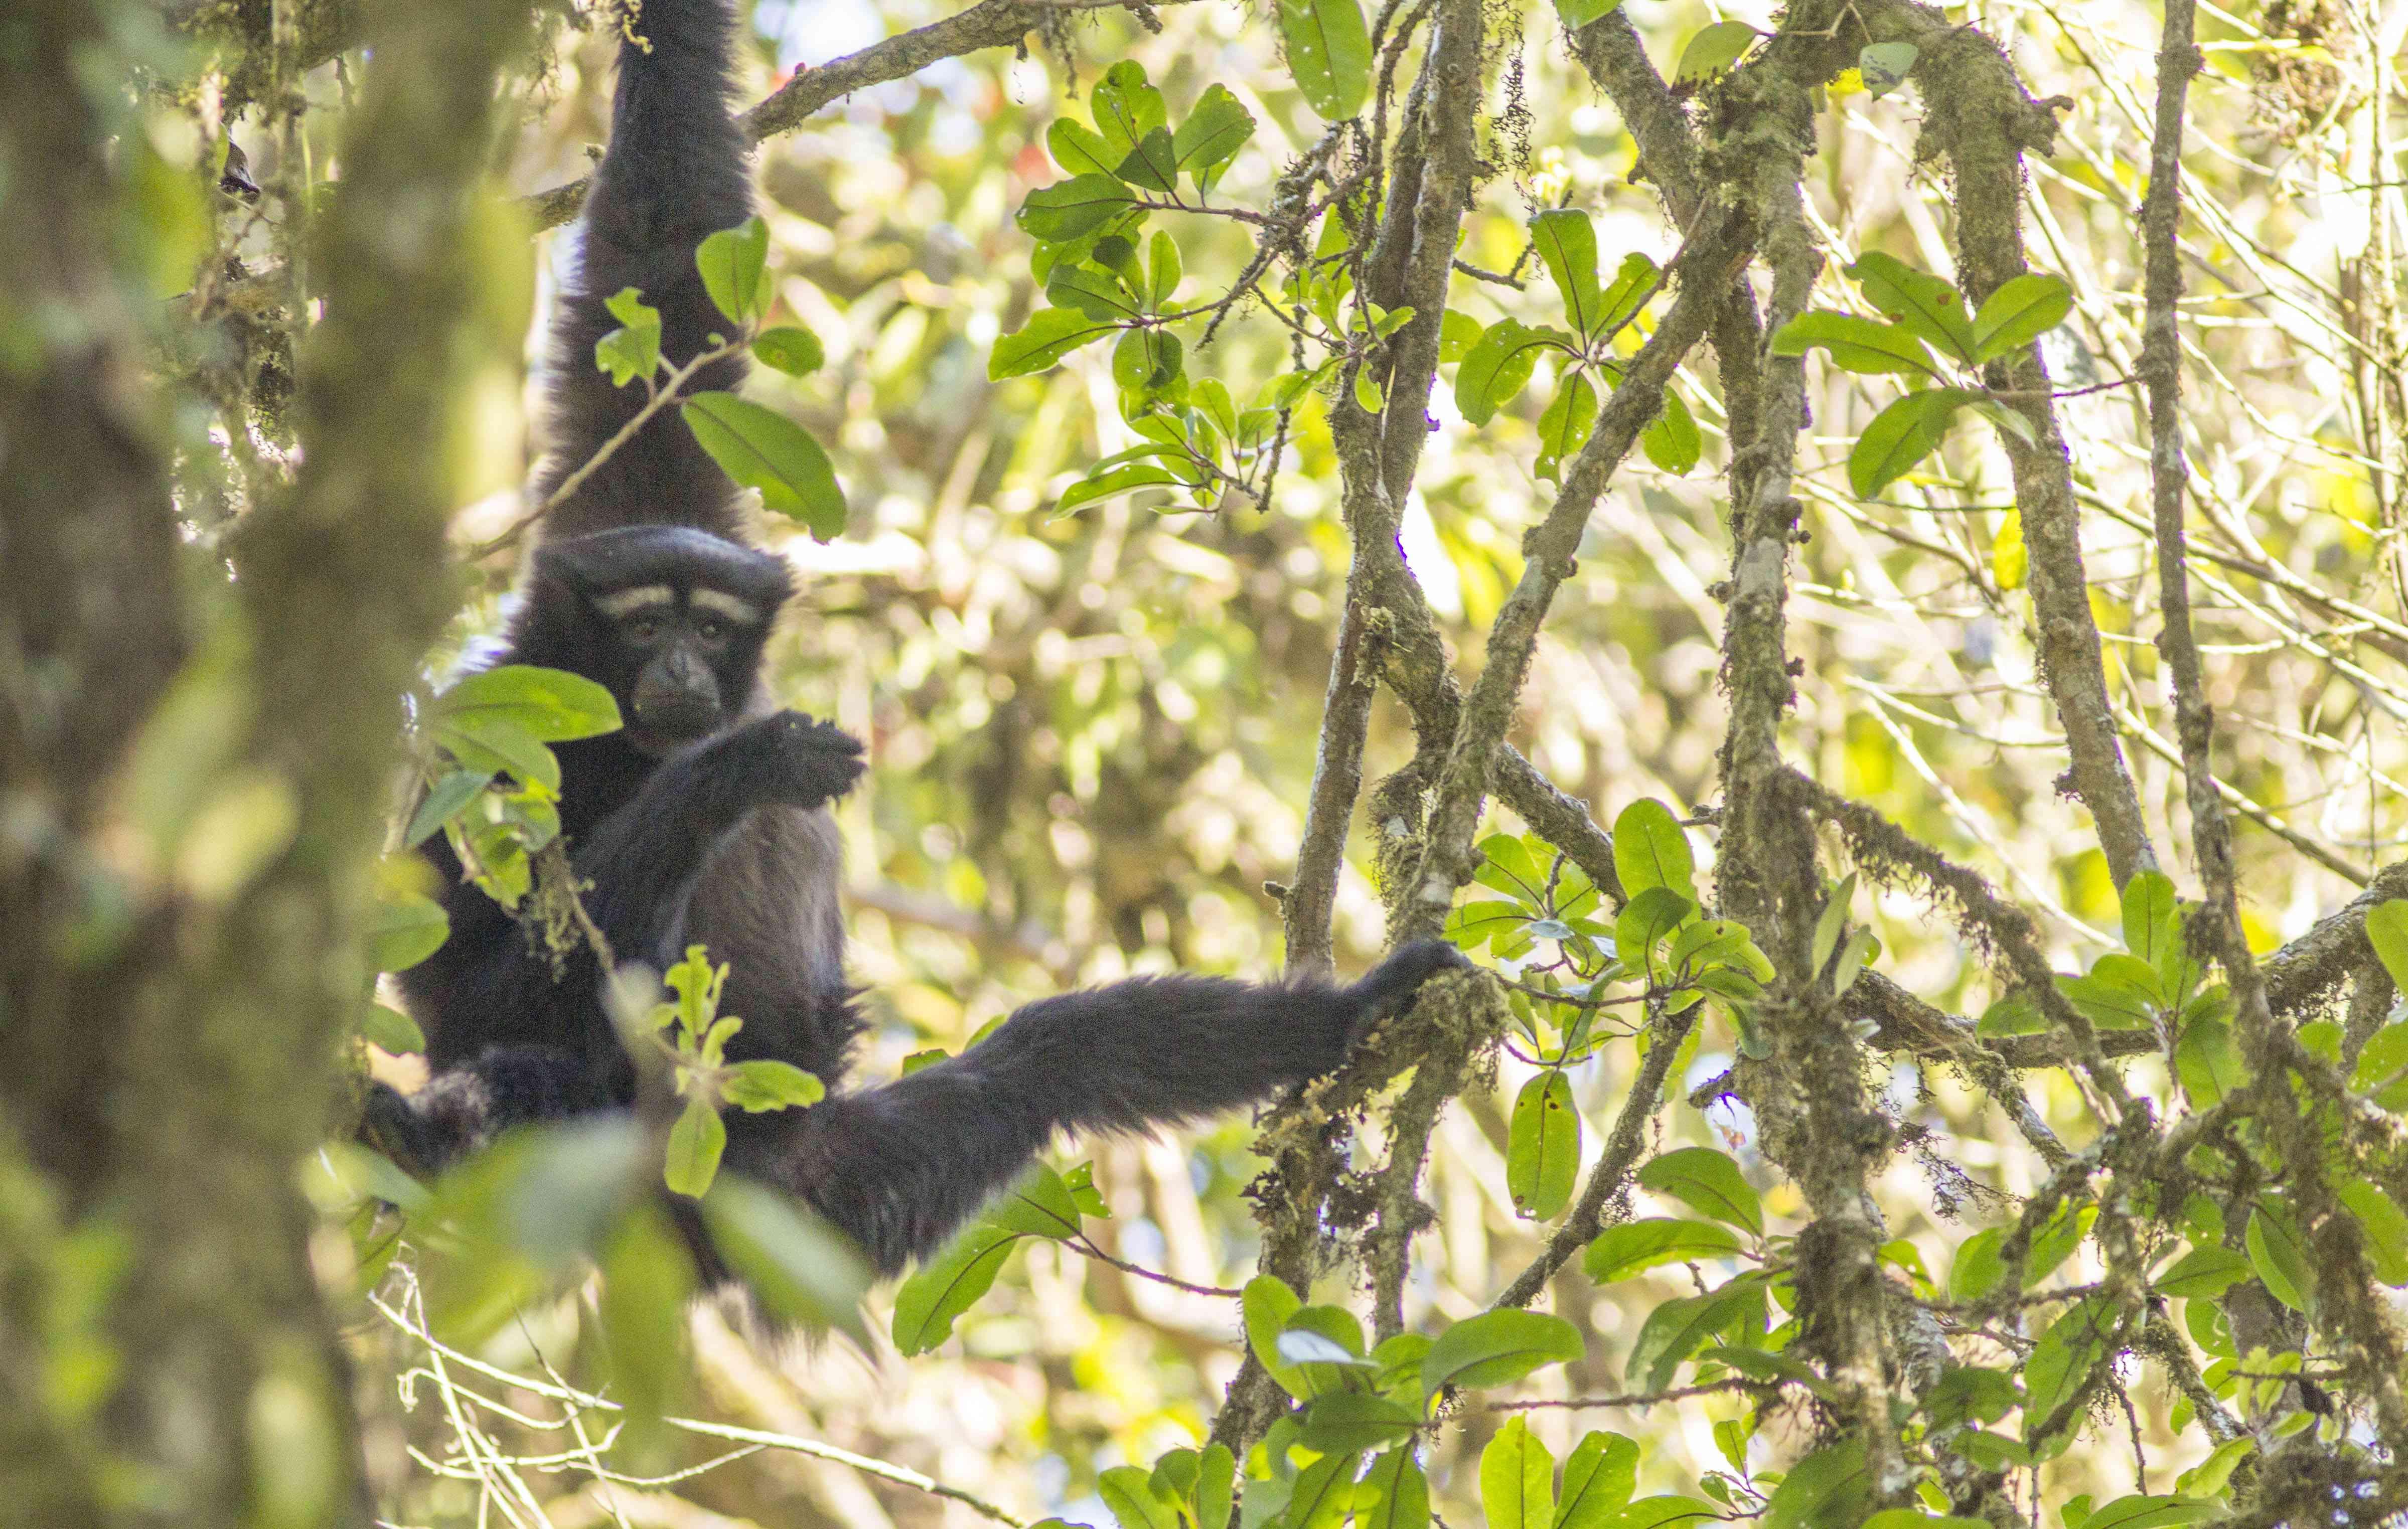 endangered Skywalker hoolock gibbon in trees